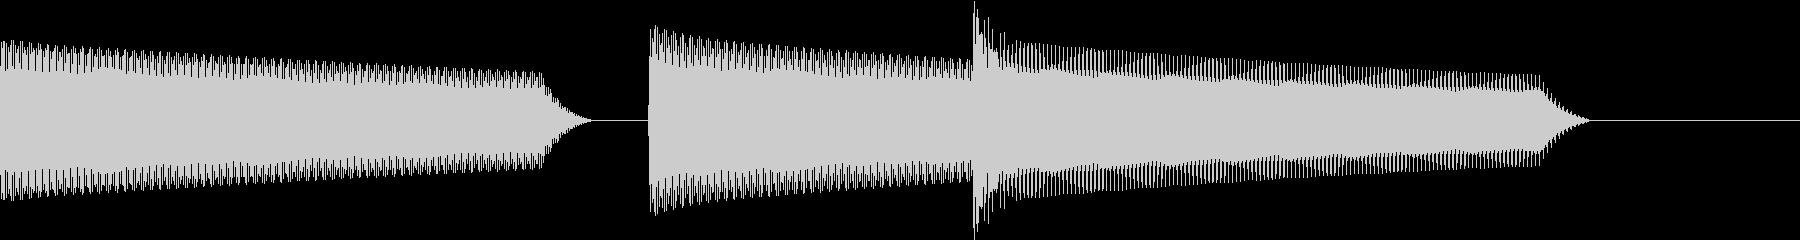 ATM 操作音 9の未再生の波形